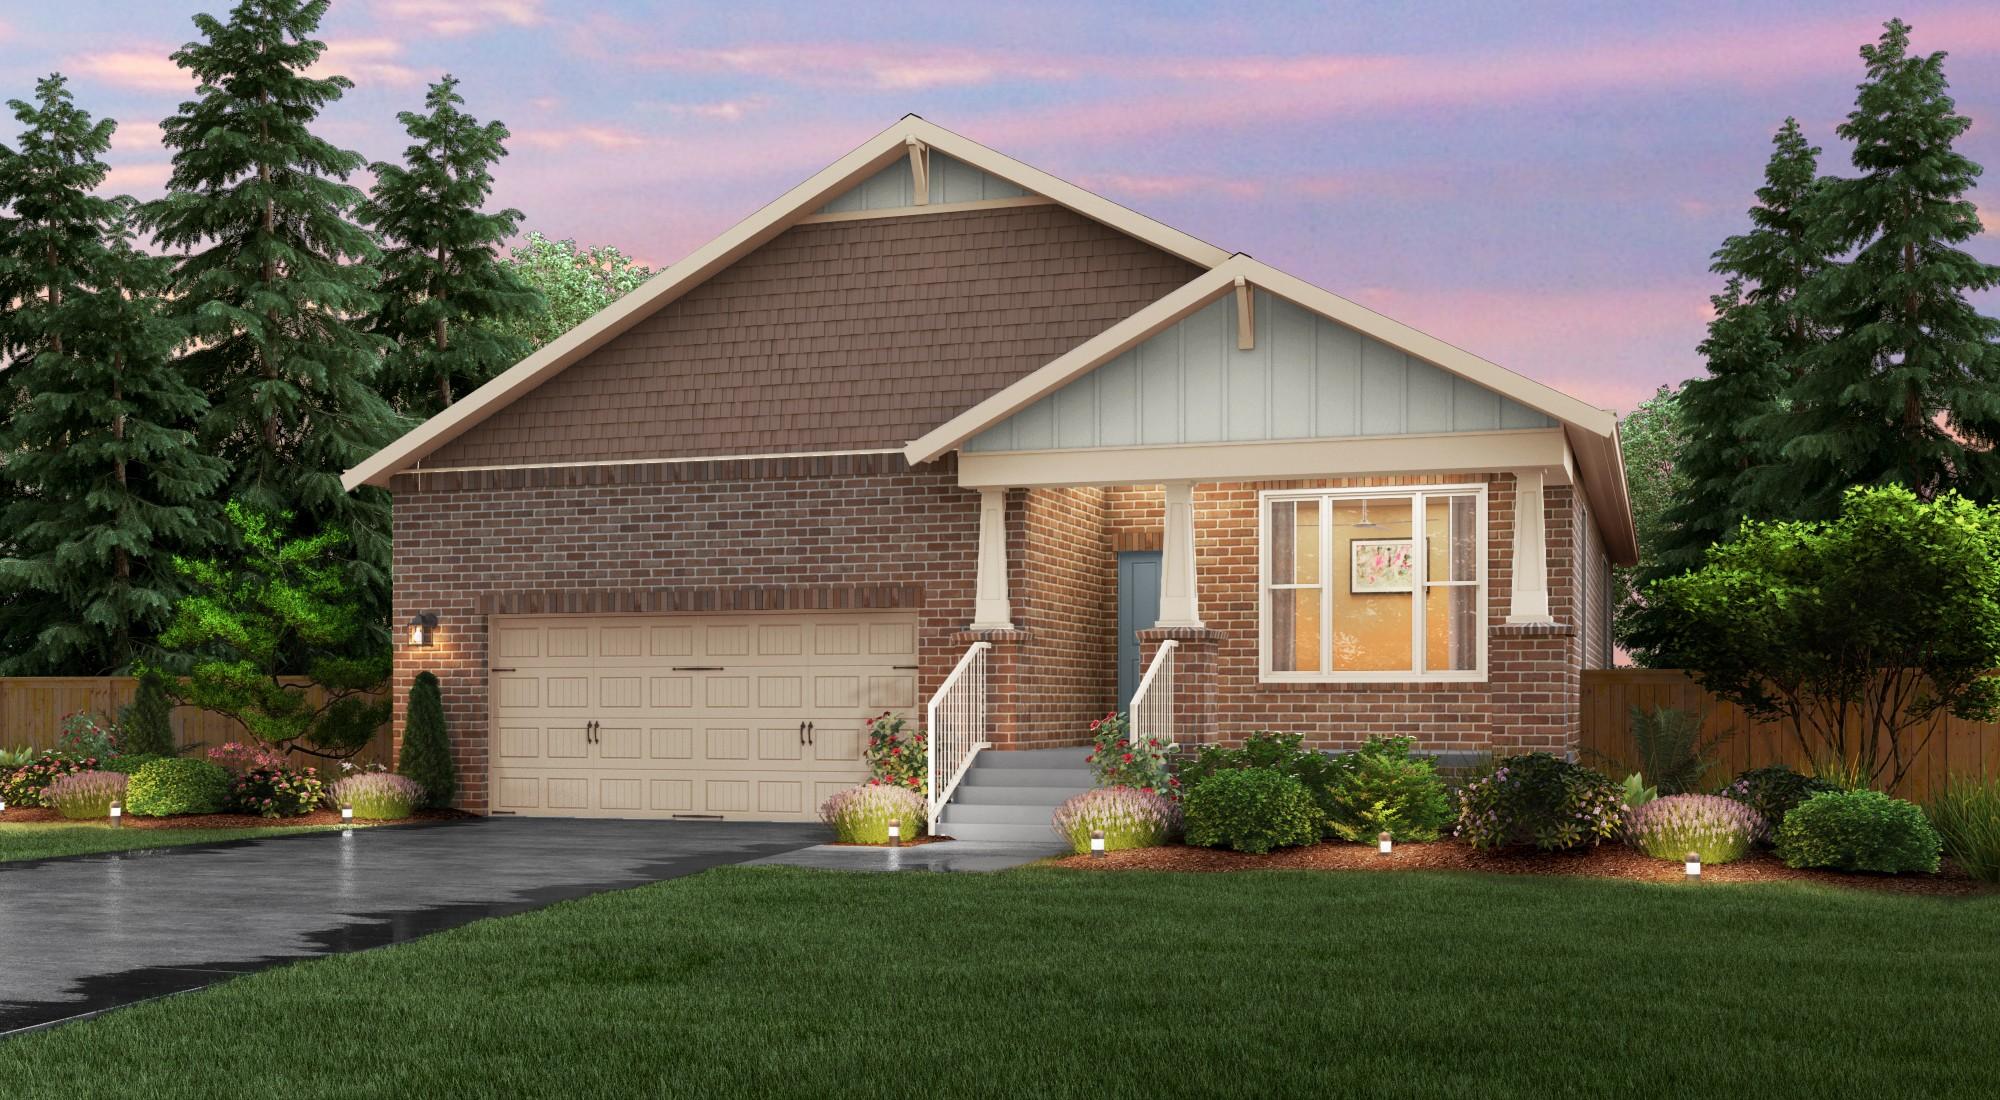 806 Carnation Dr Lot 124, Smyrna, TN 37167 - Smyrna, TN real estate listing